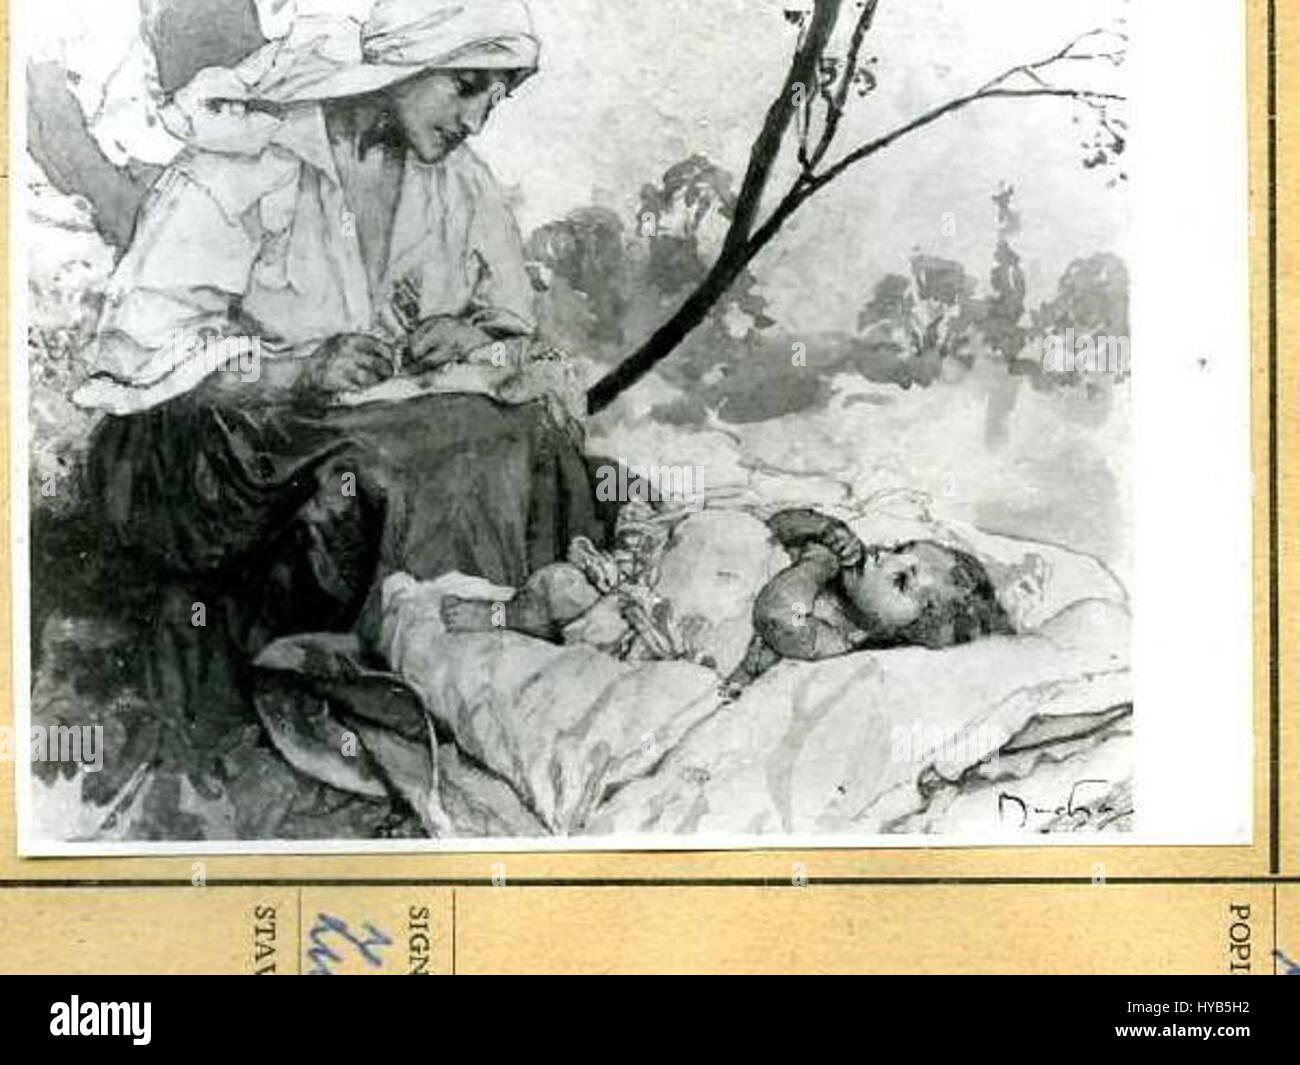 Autor Alfons Mucha 24.7.1860 14.7.1939 Matka sedici nad ditetem ilustrace ke knize Slavia starostlivym matkam Foto de stock